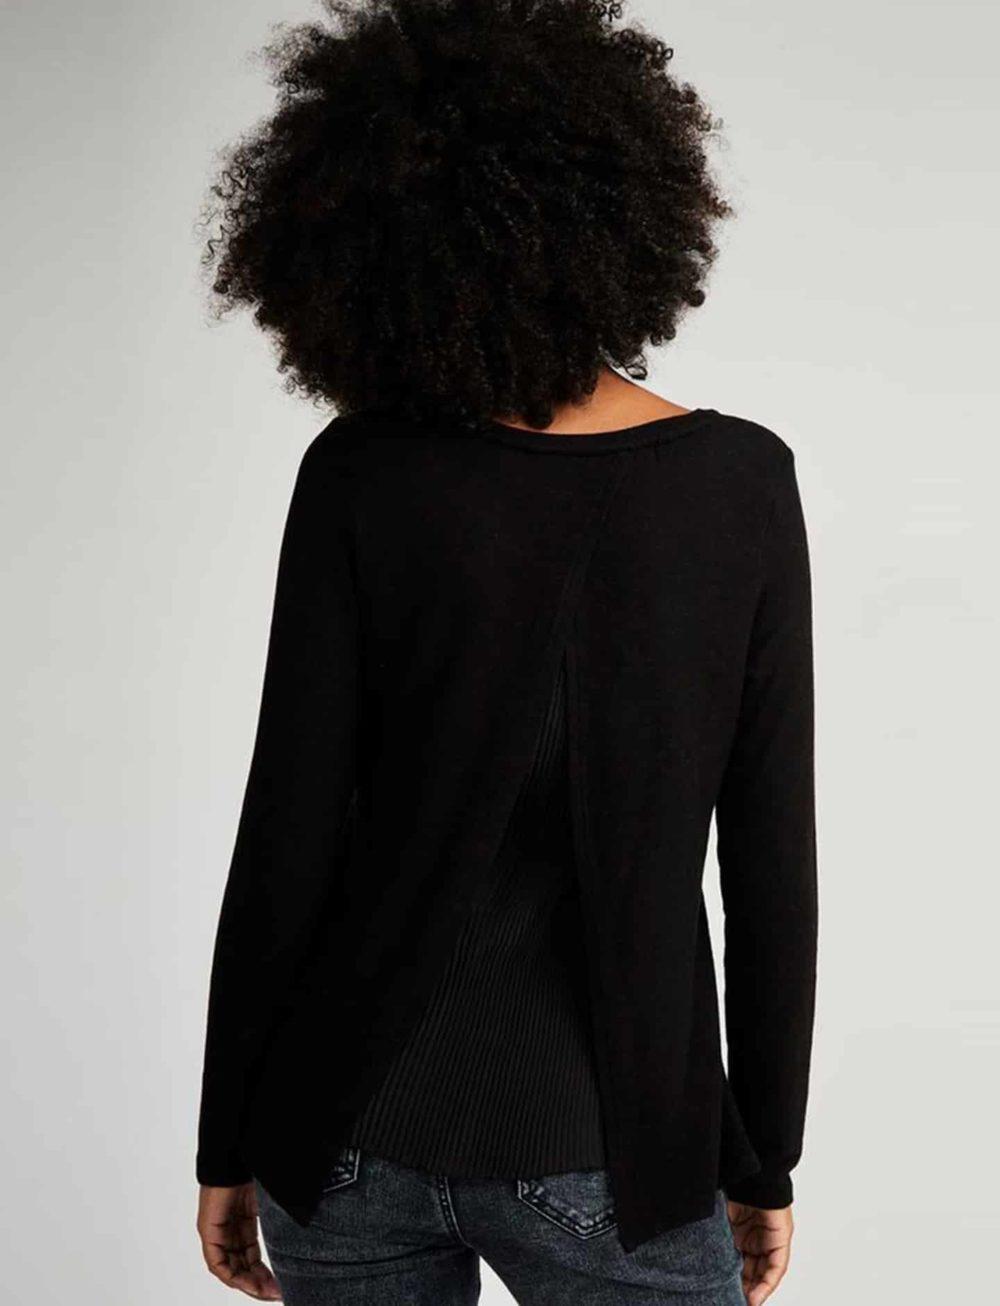 camiseta-combinada-negra-espalda